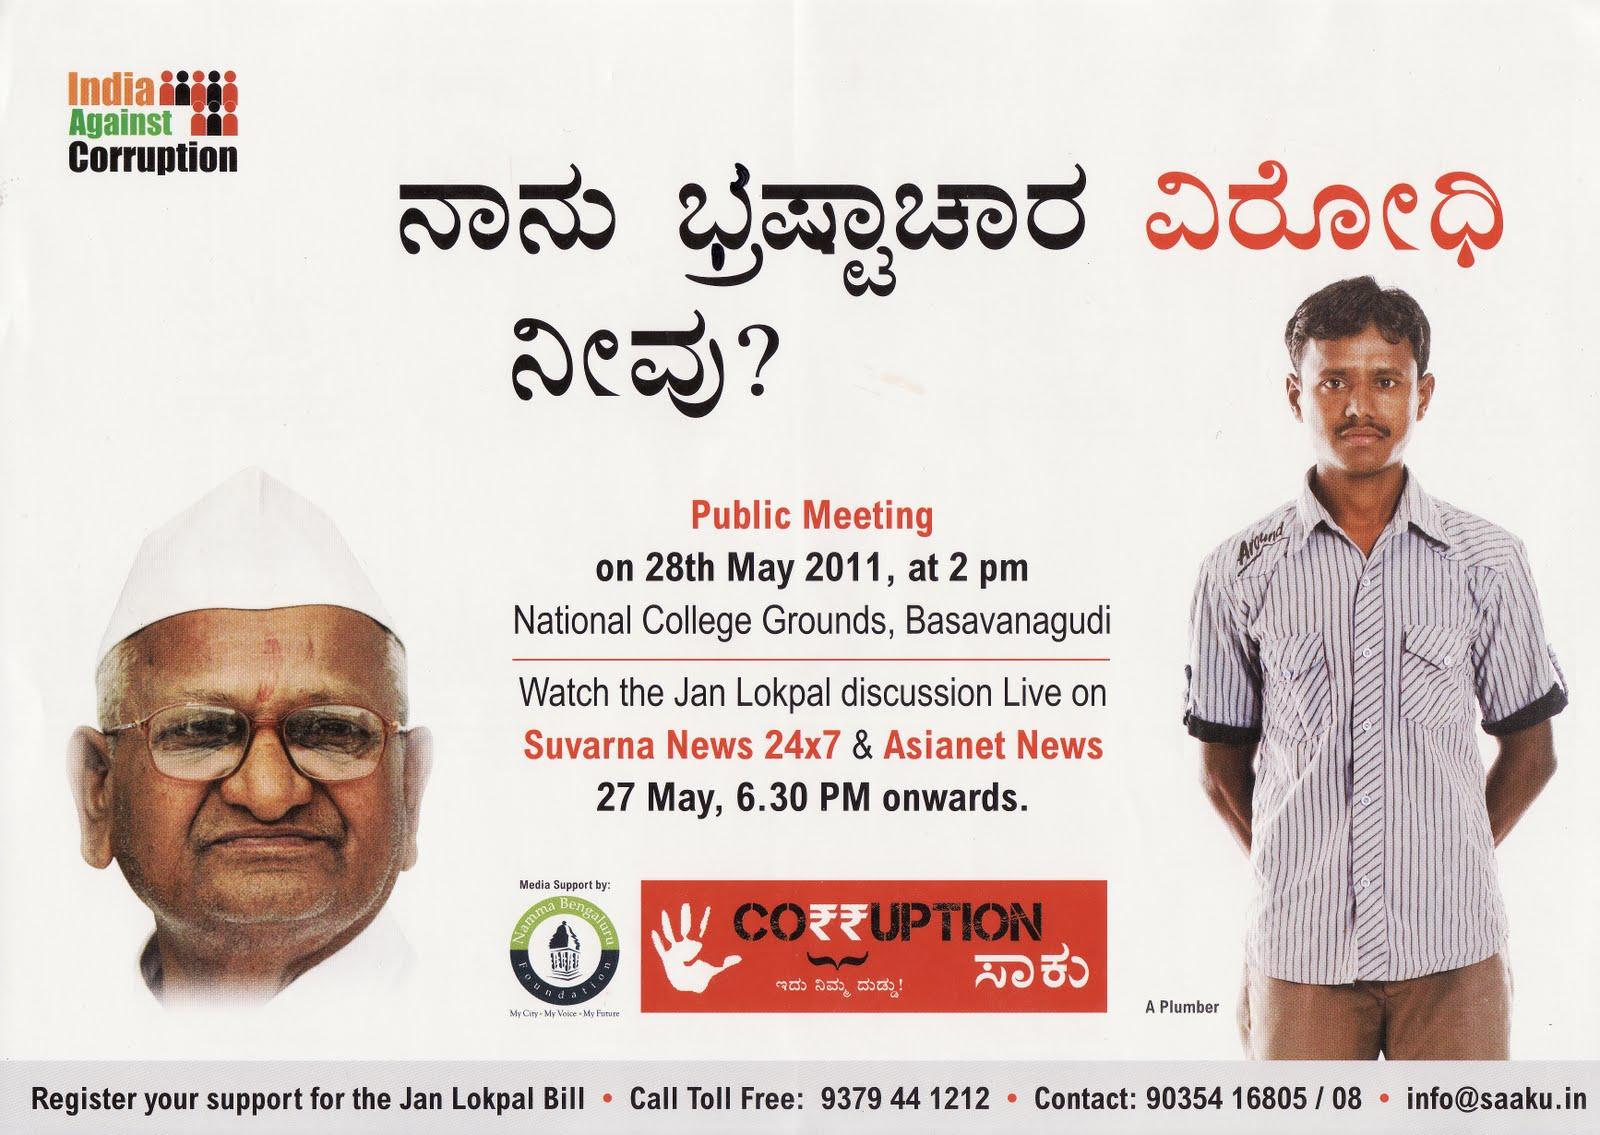 versatile genie against corruption new posters  against corruption new posters